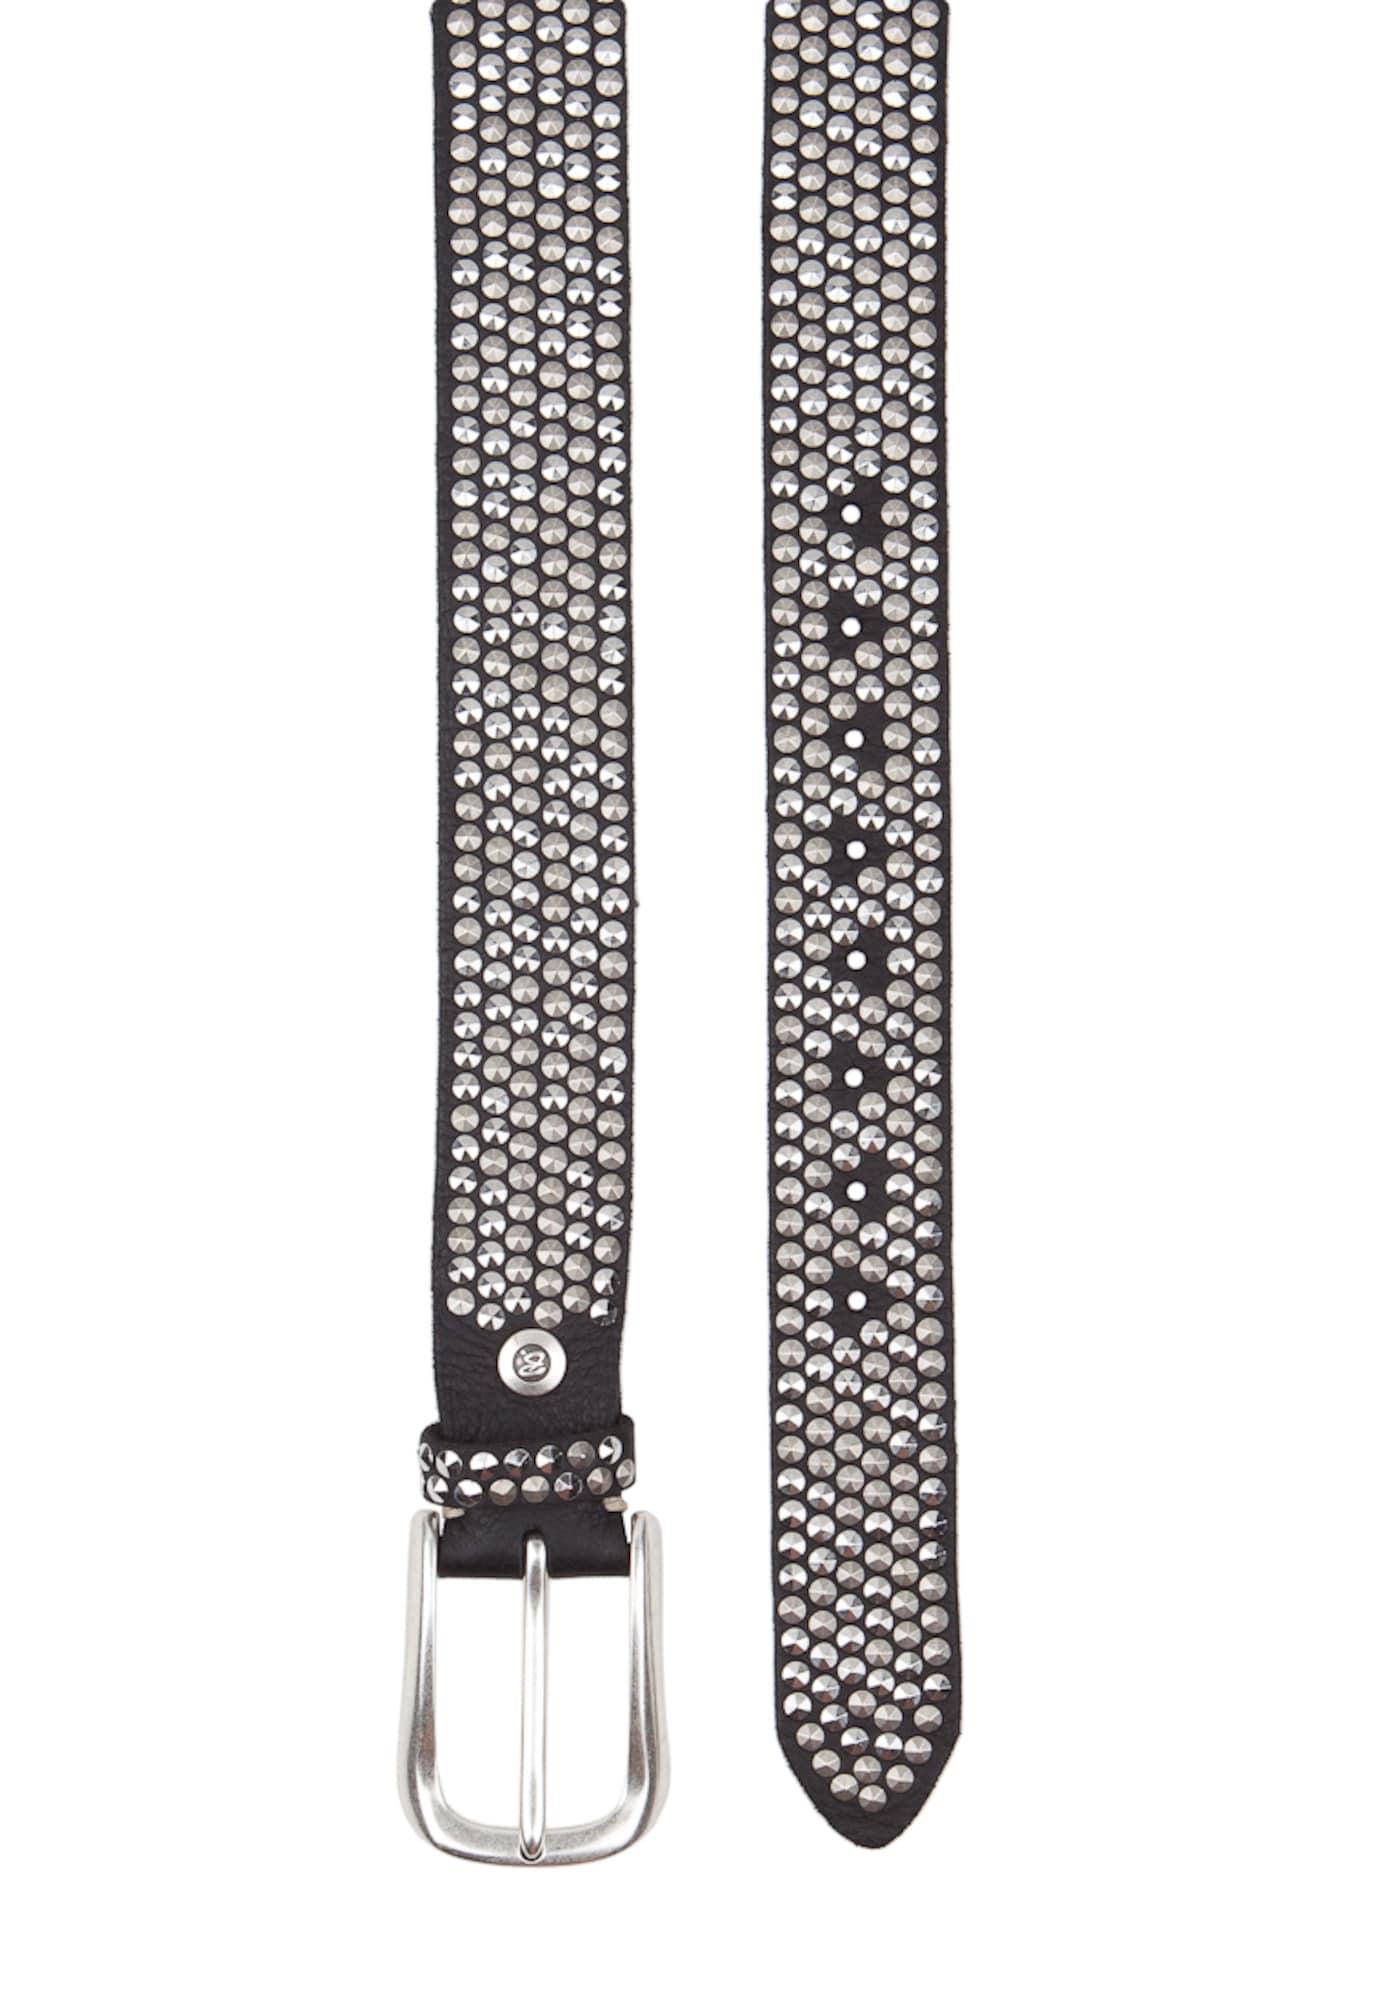 B.belt Handmade In Germany, Dames Riem, zwart